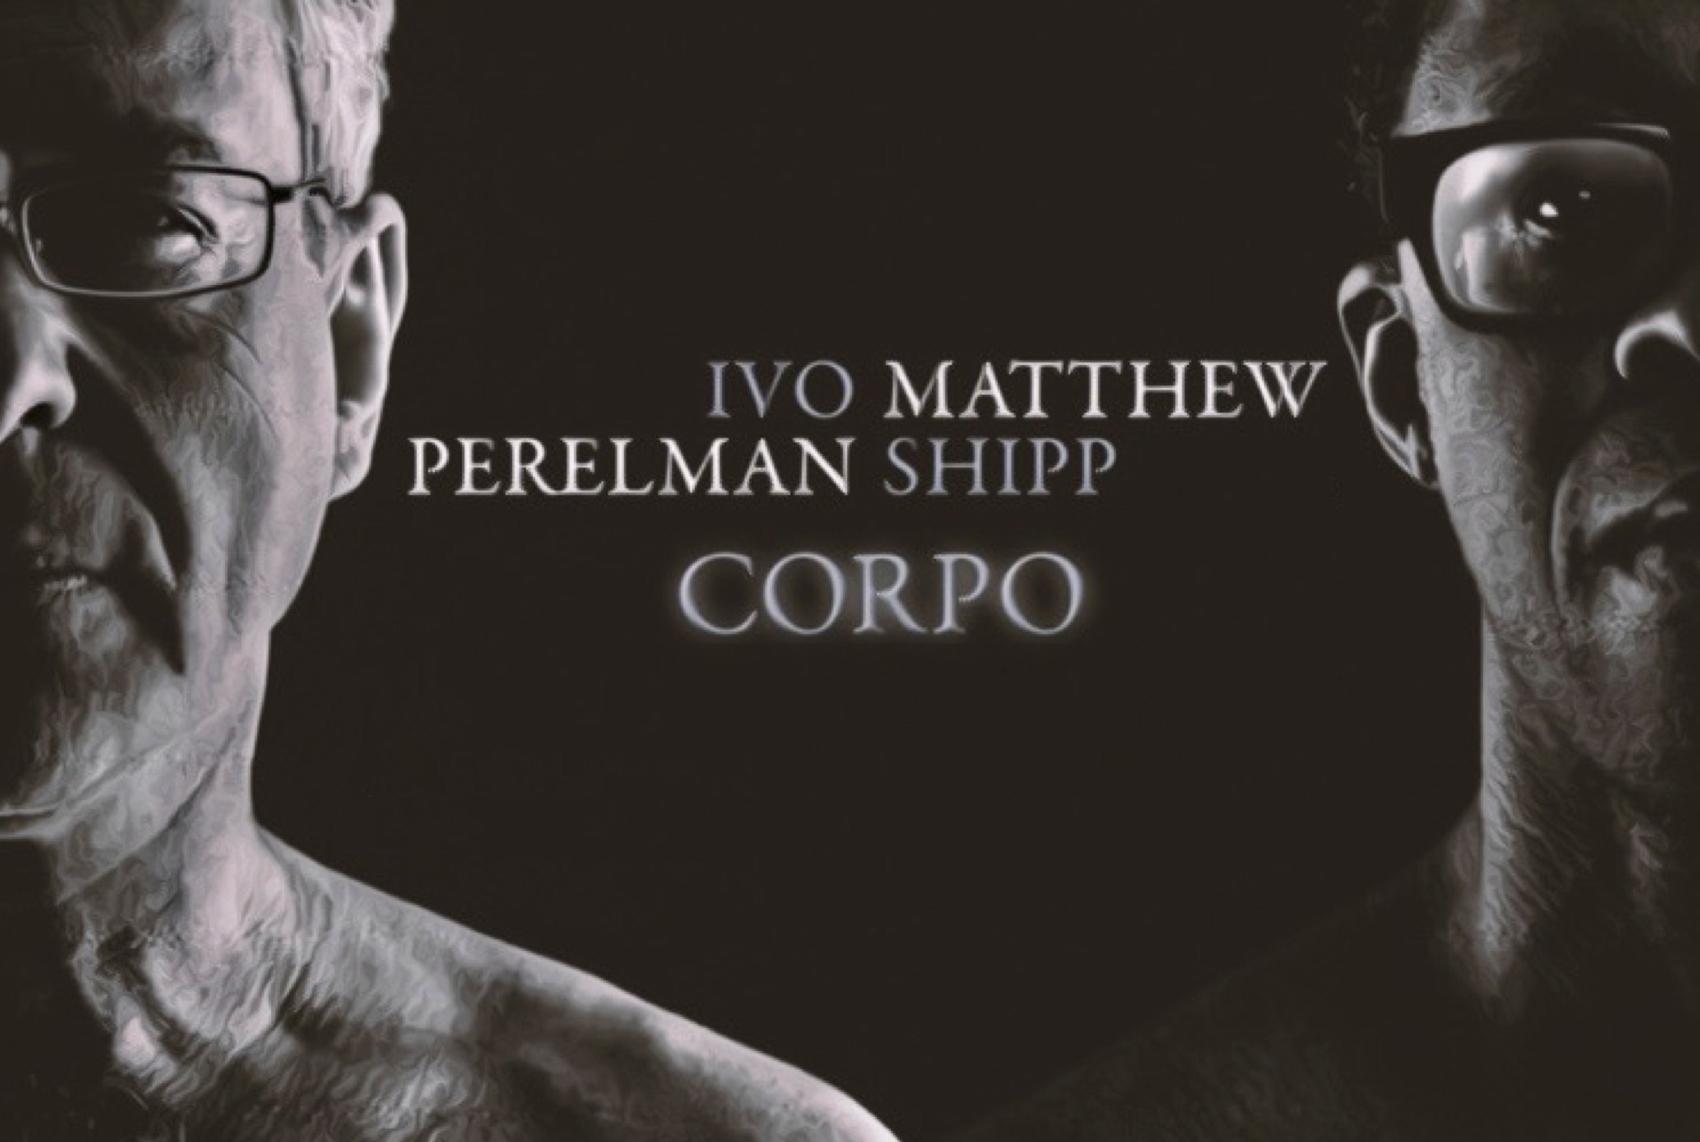 MATTHEW SHIPP & IVO PERELMAN